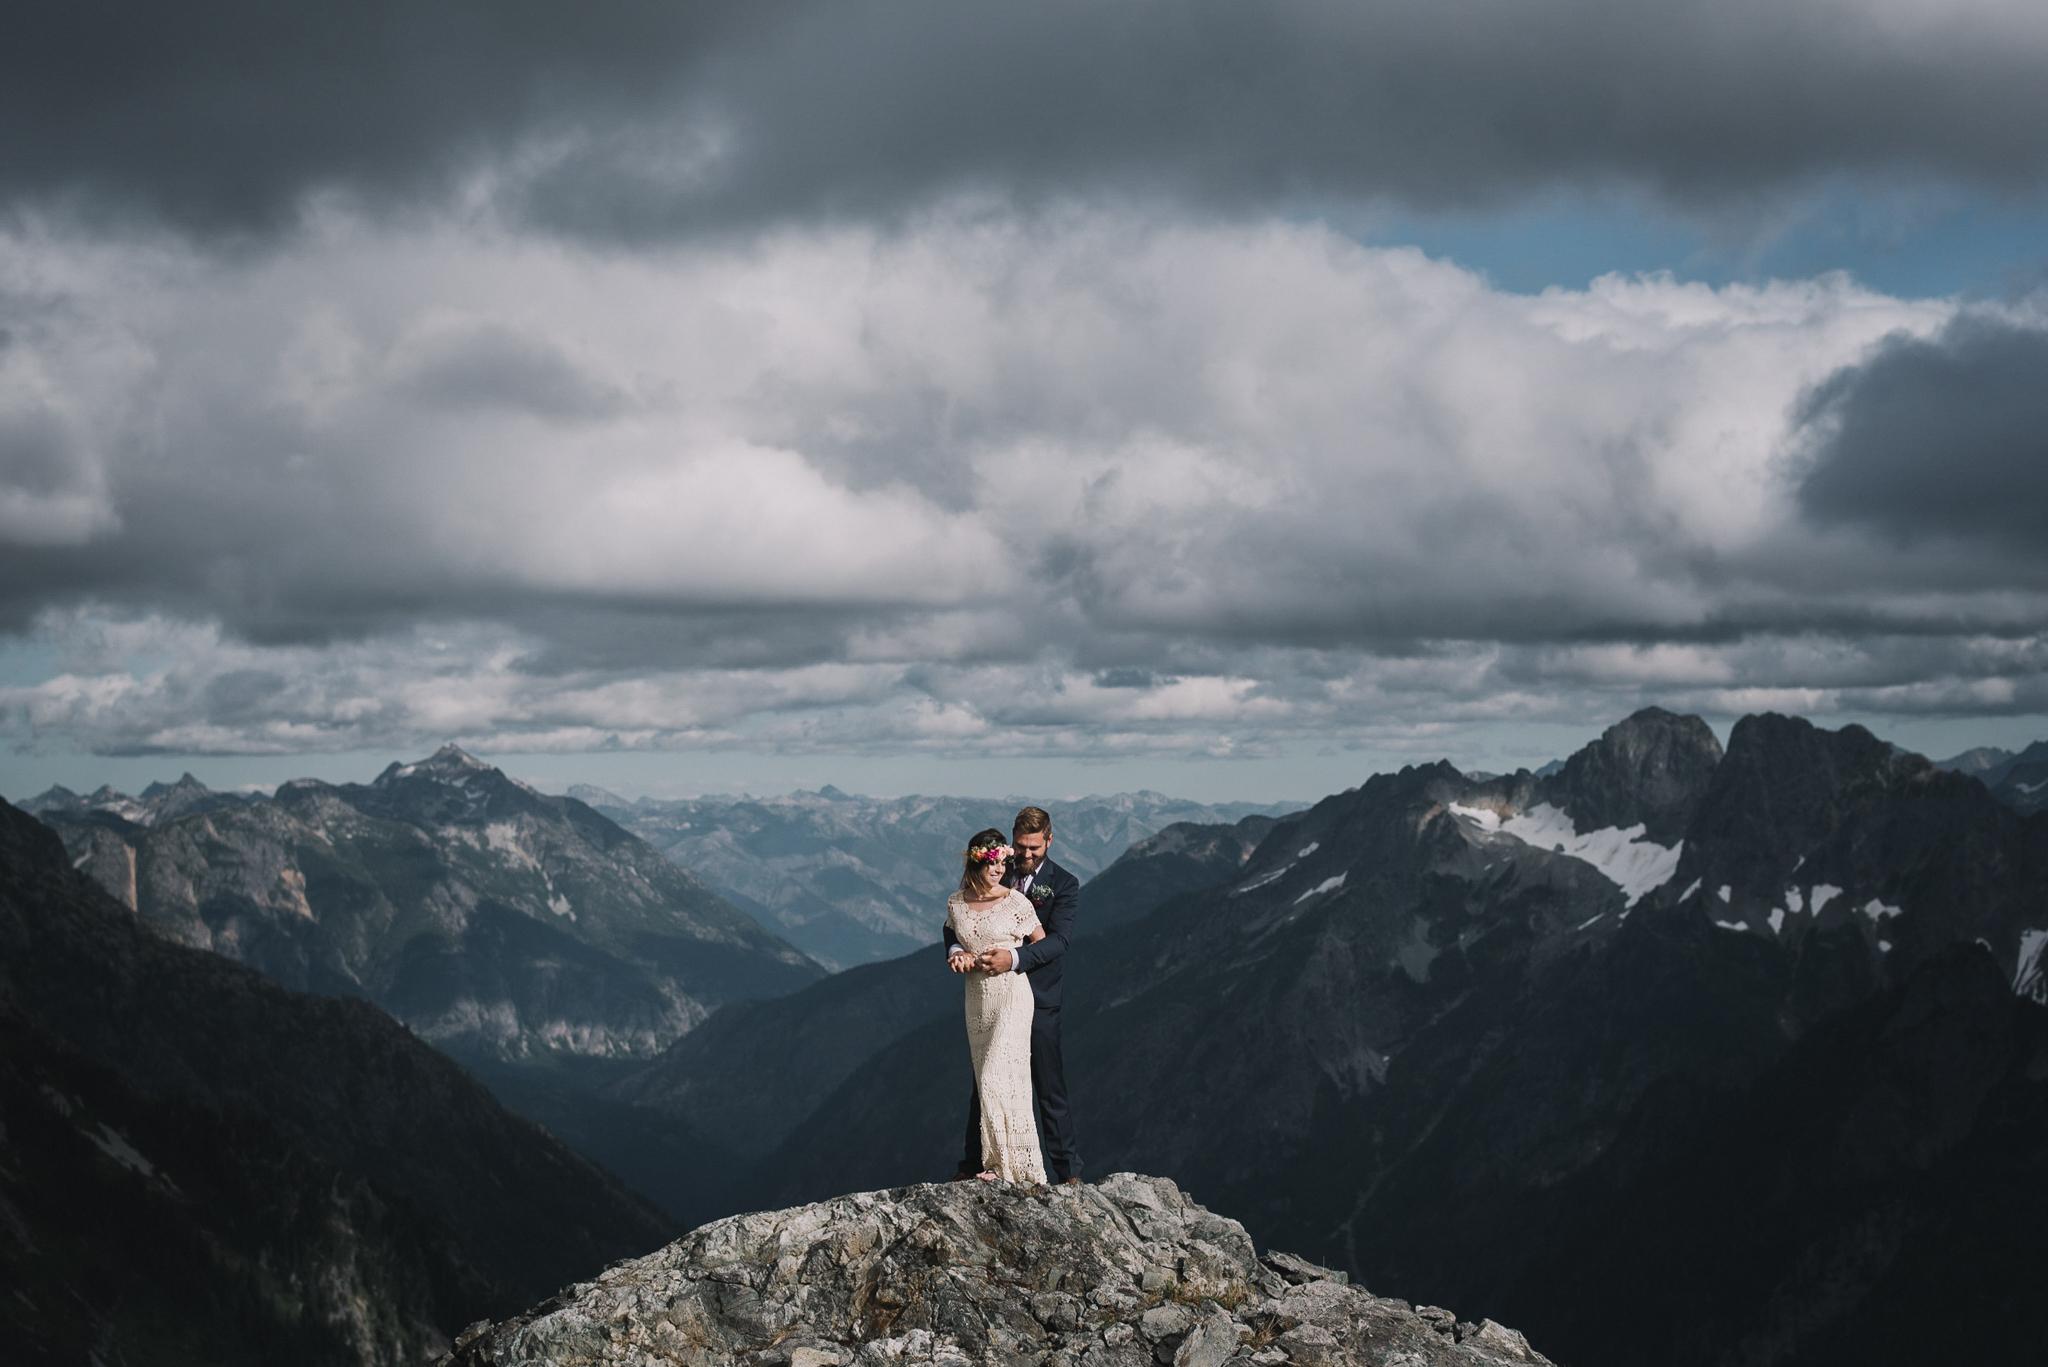 Sahale Arm Elopement In The North Cascades, Washington | Taylor & David